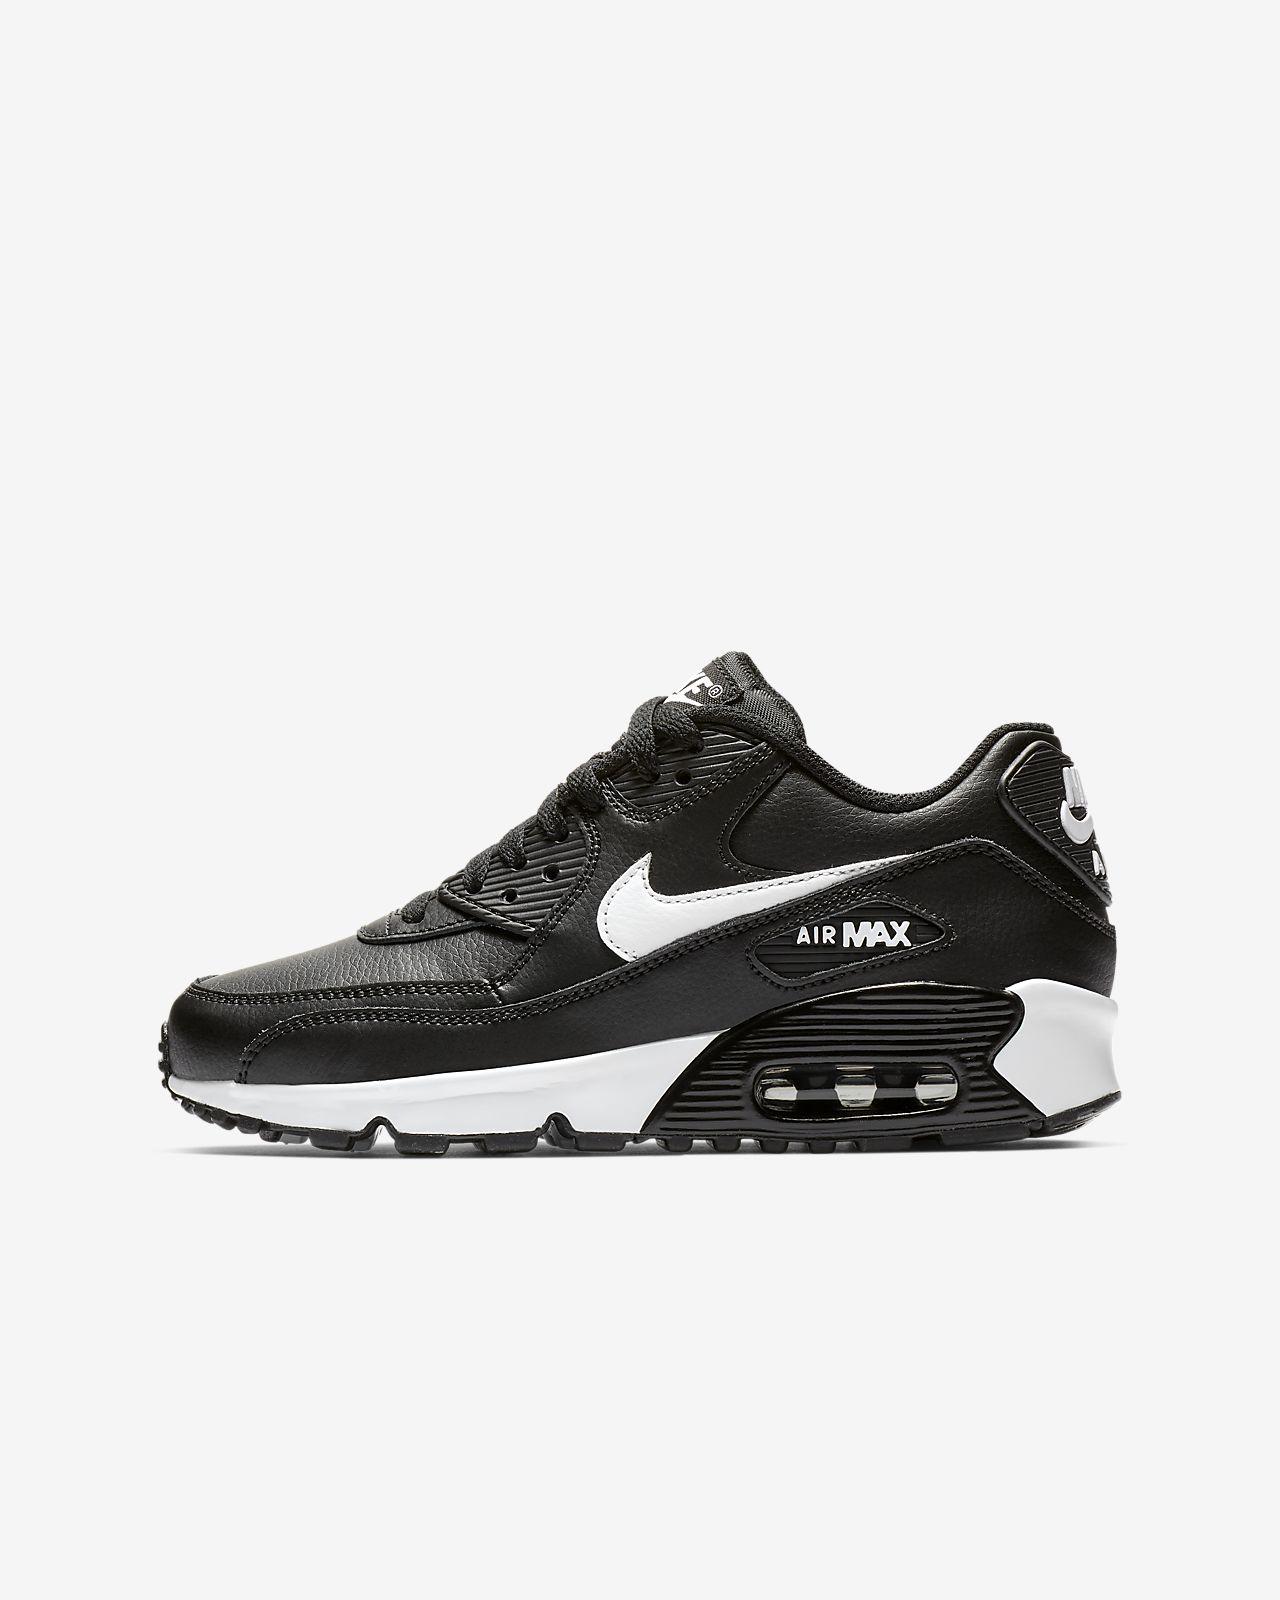 premium selection 02cb3 d76f8 ... Nike Air Max 90 Leather Schuh für ältere Kinder